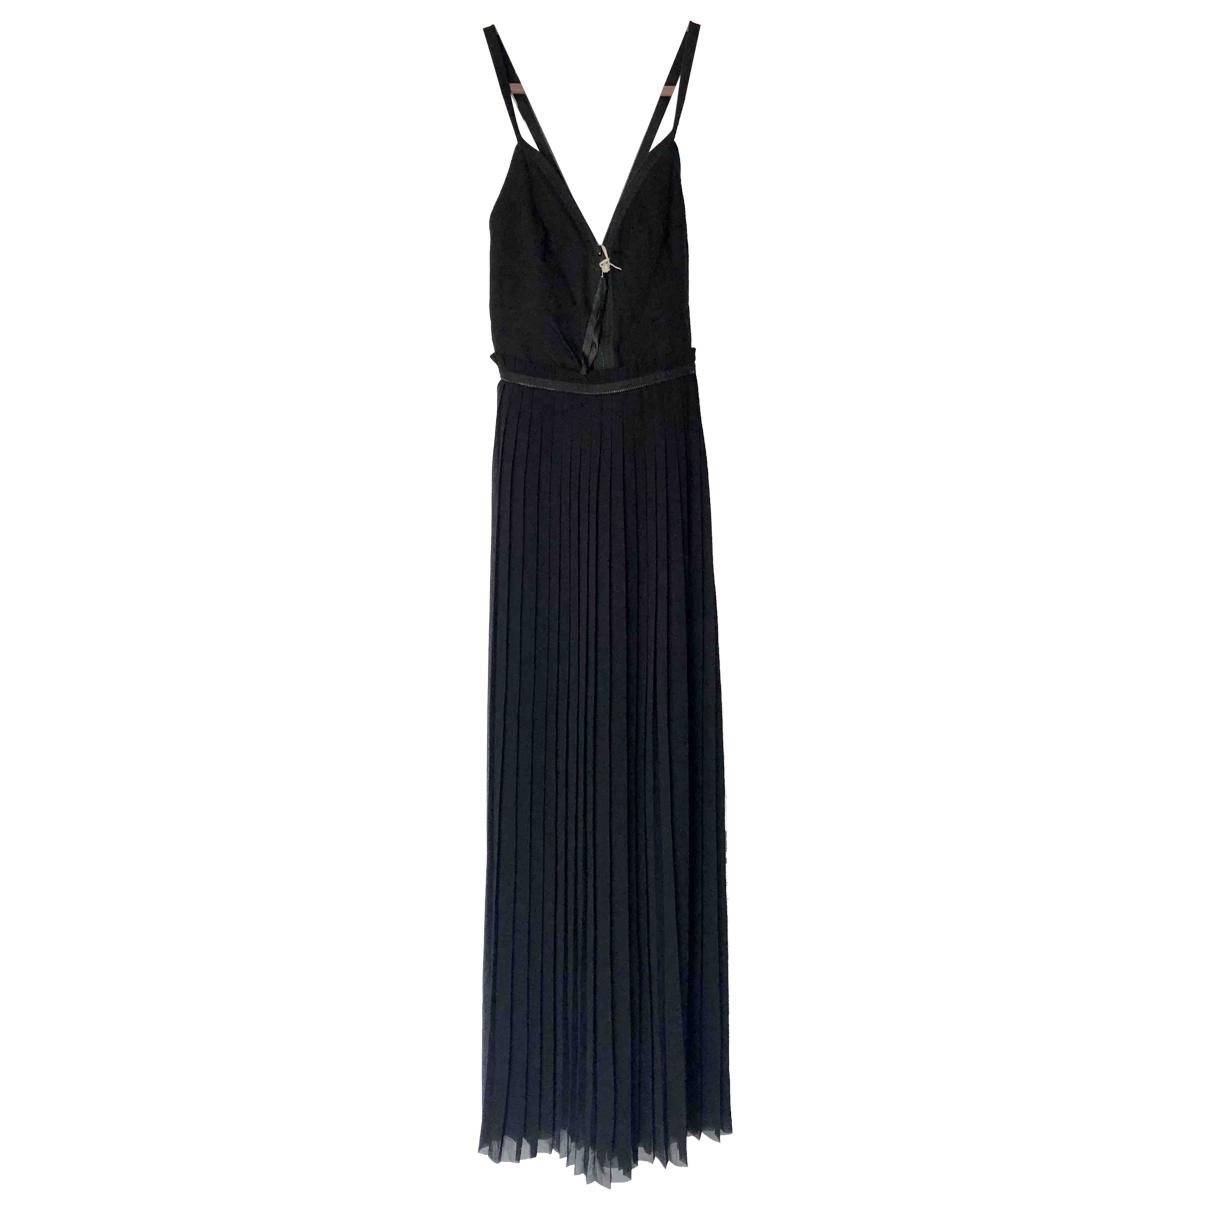 Diesel \N Black Cotton dress for Women XS International